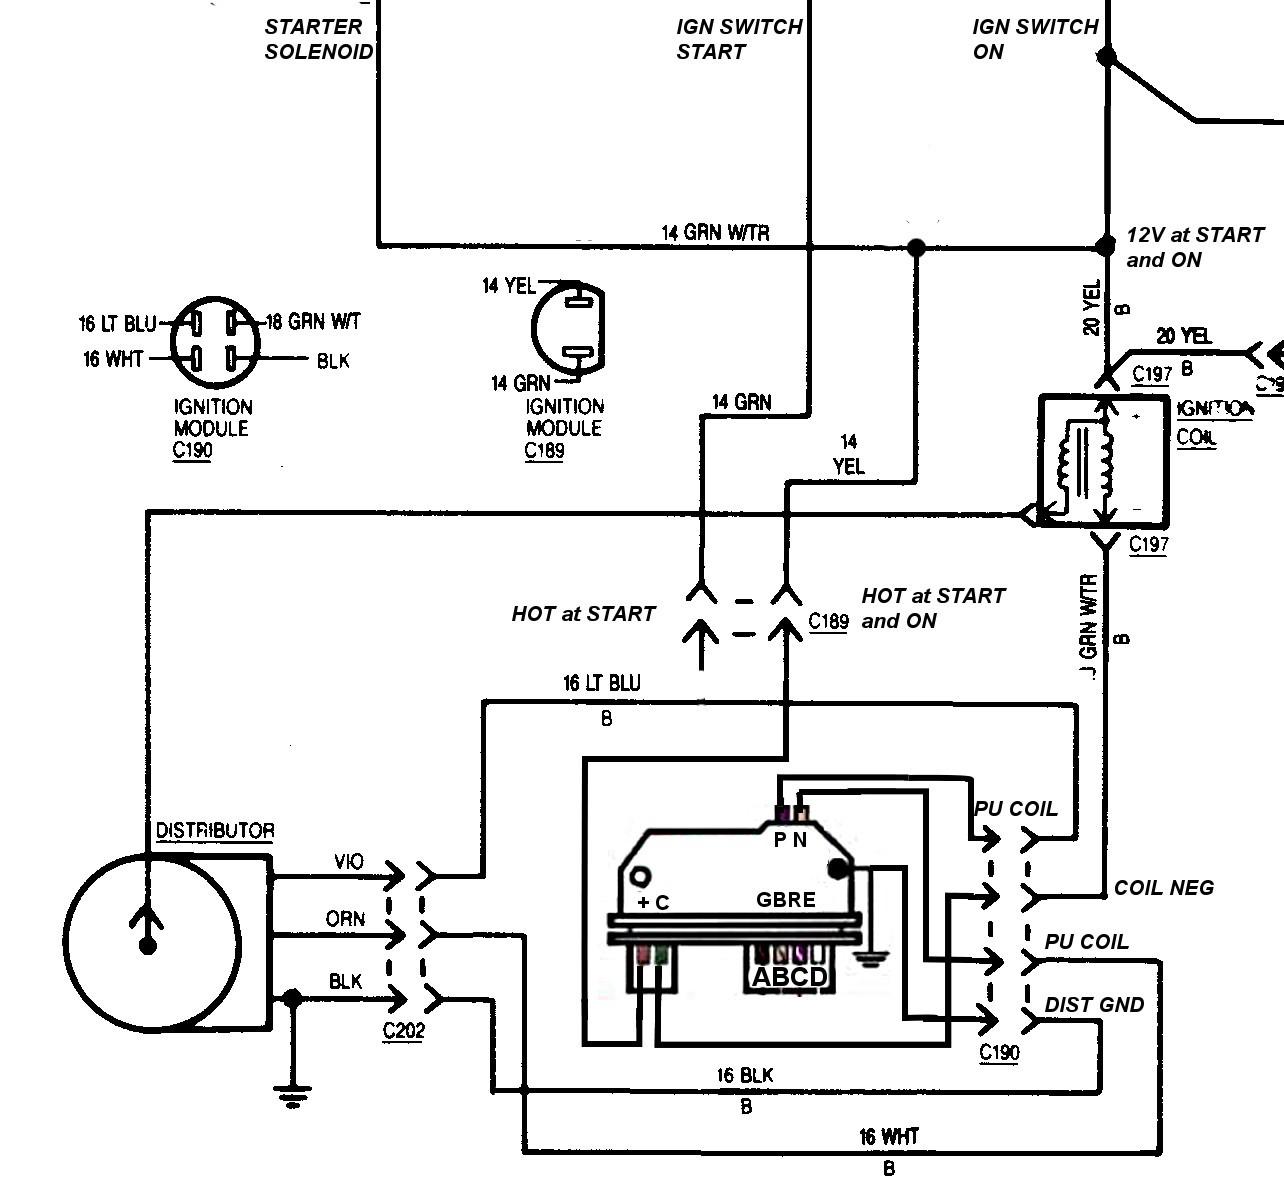 Duraspark Wiring Diagram 1965 Mustang